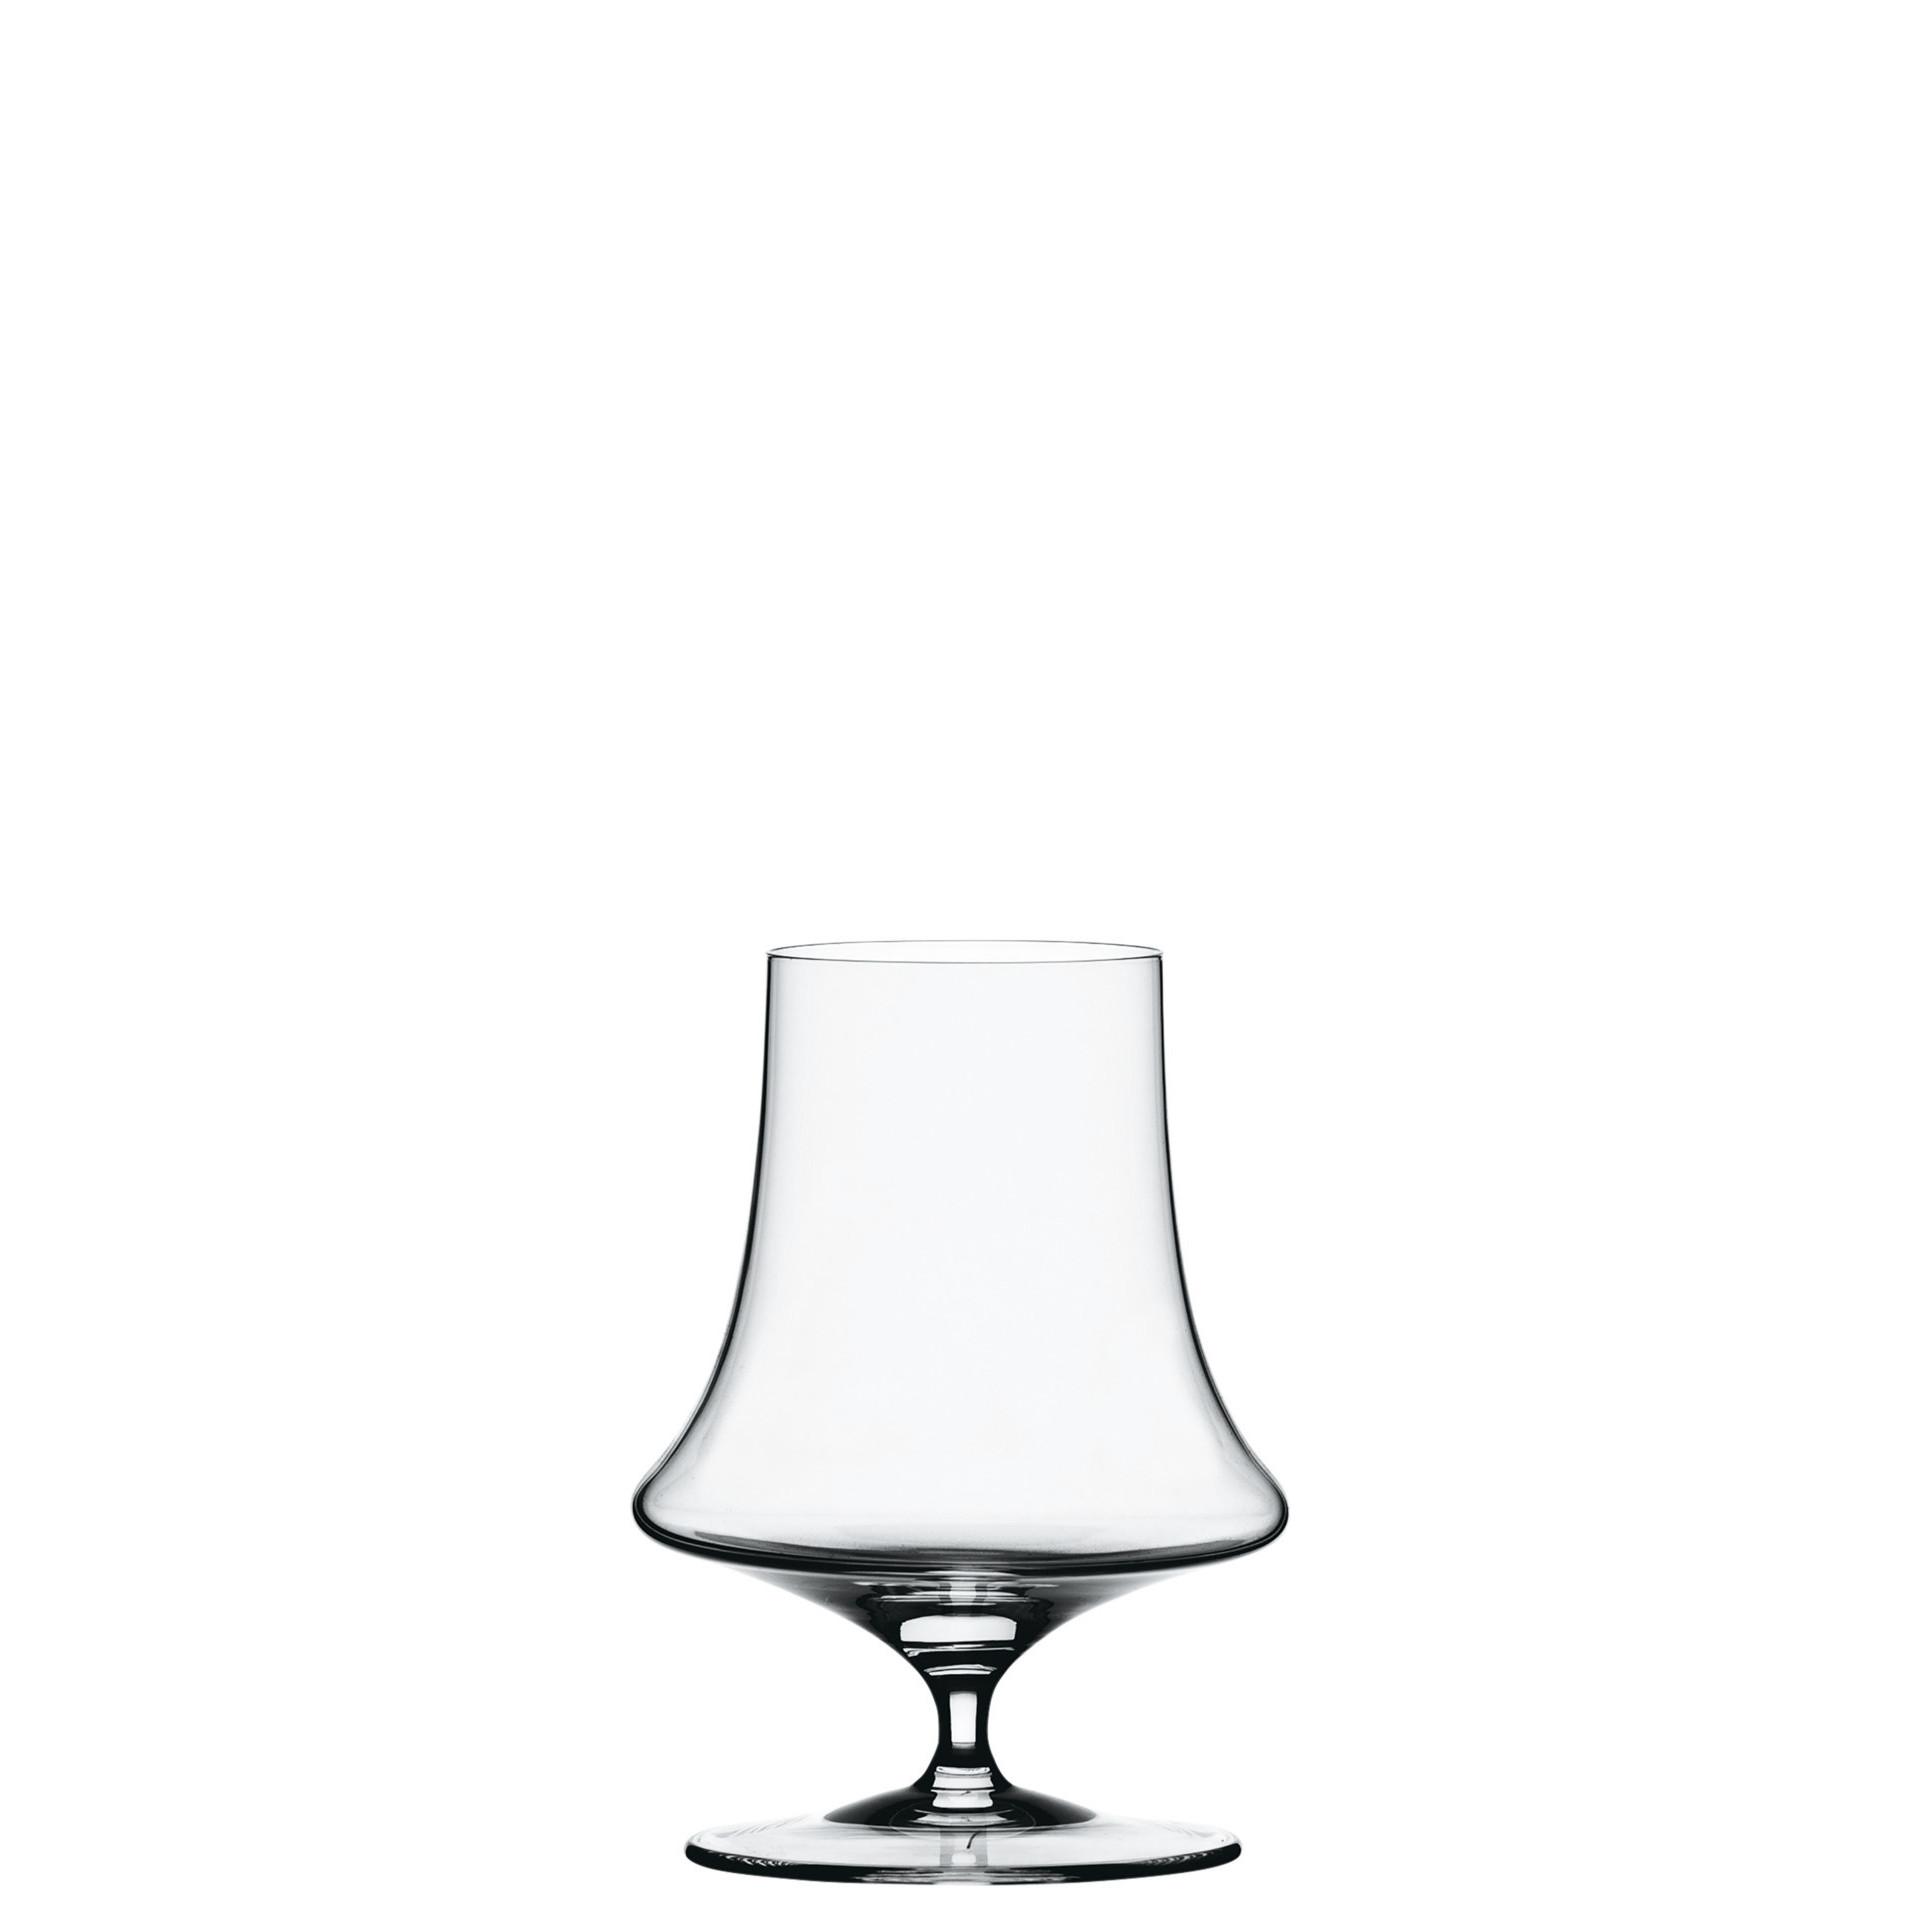 Willsberger Anniversary, Whiskyglas ø 98 mm / 0,37 l